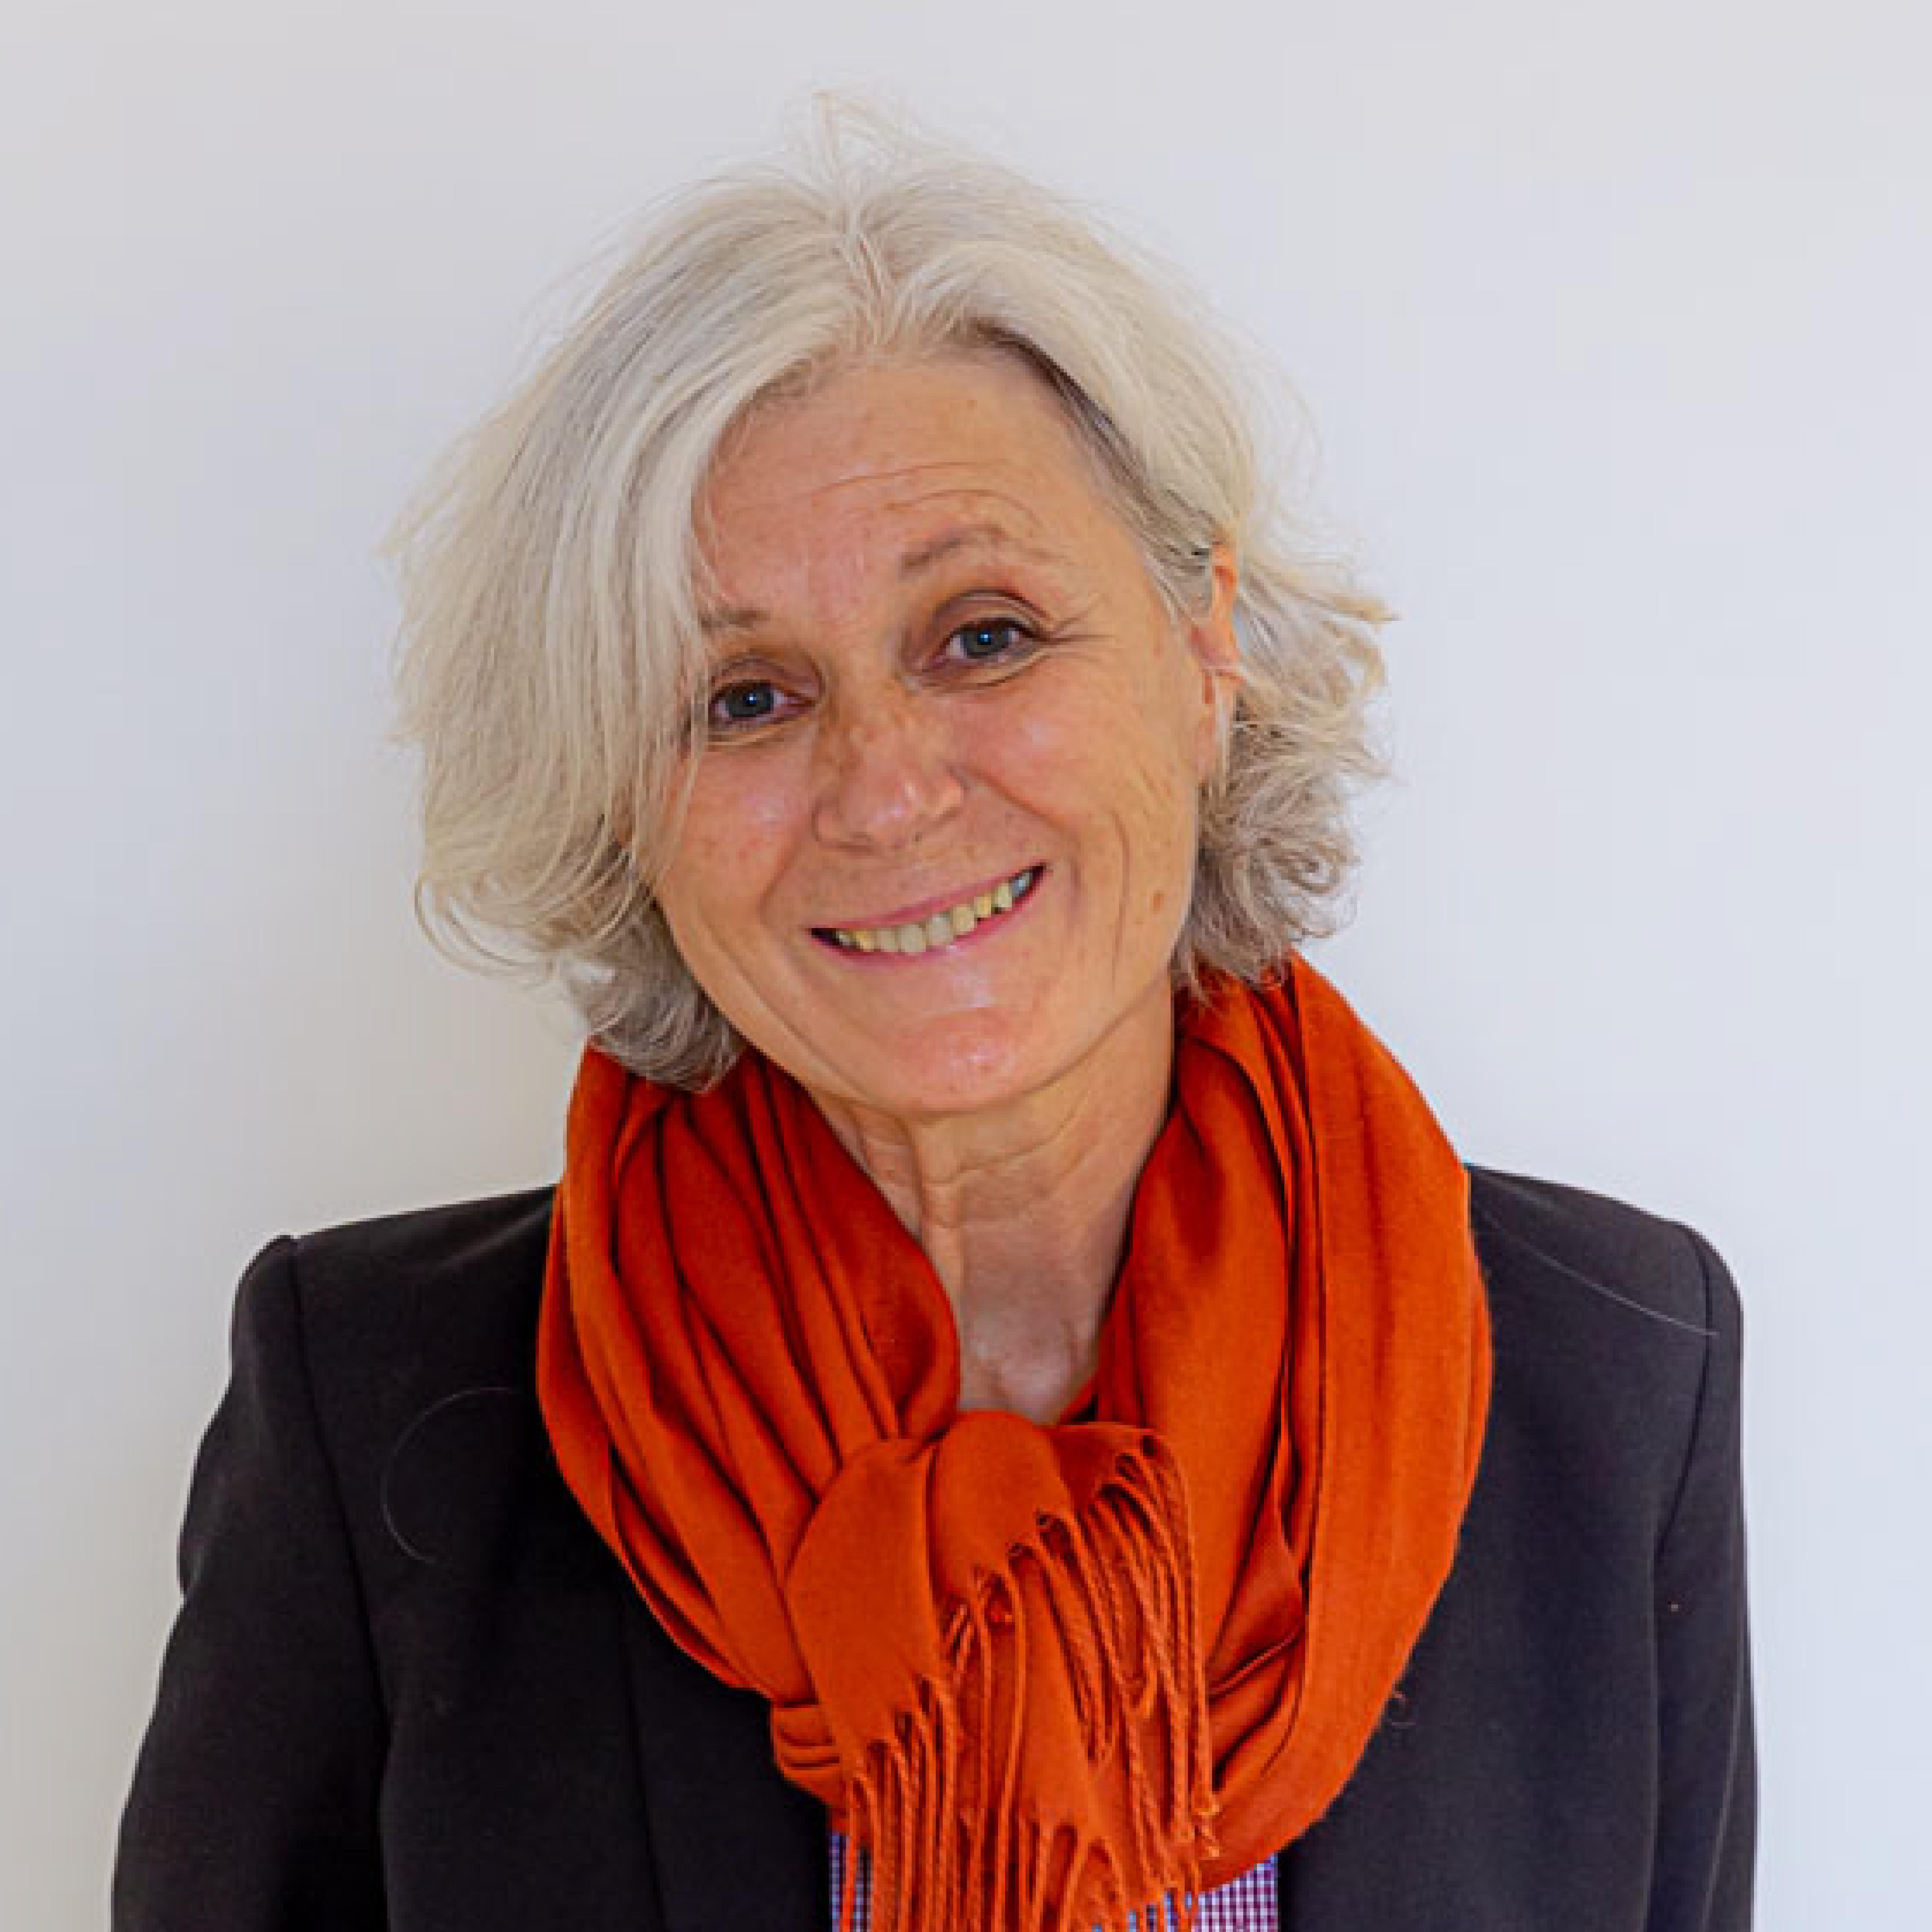 Véronique Van Den Heede